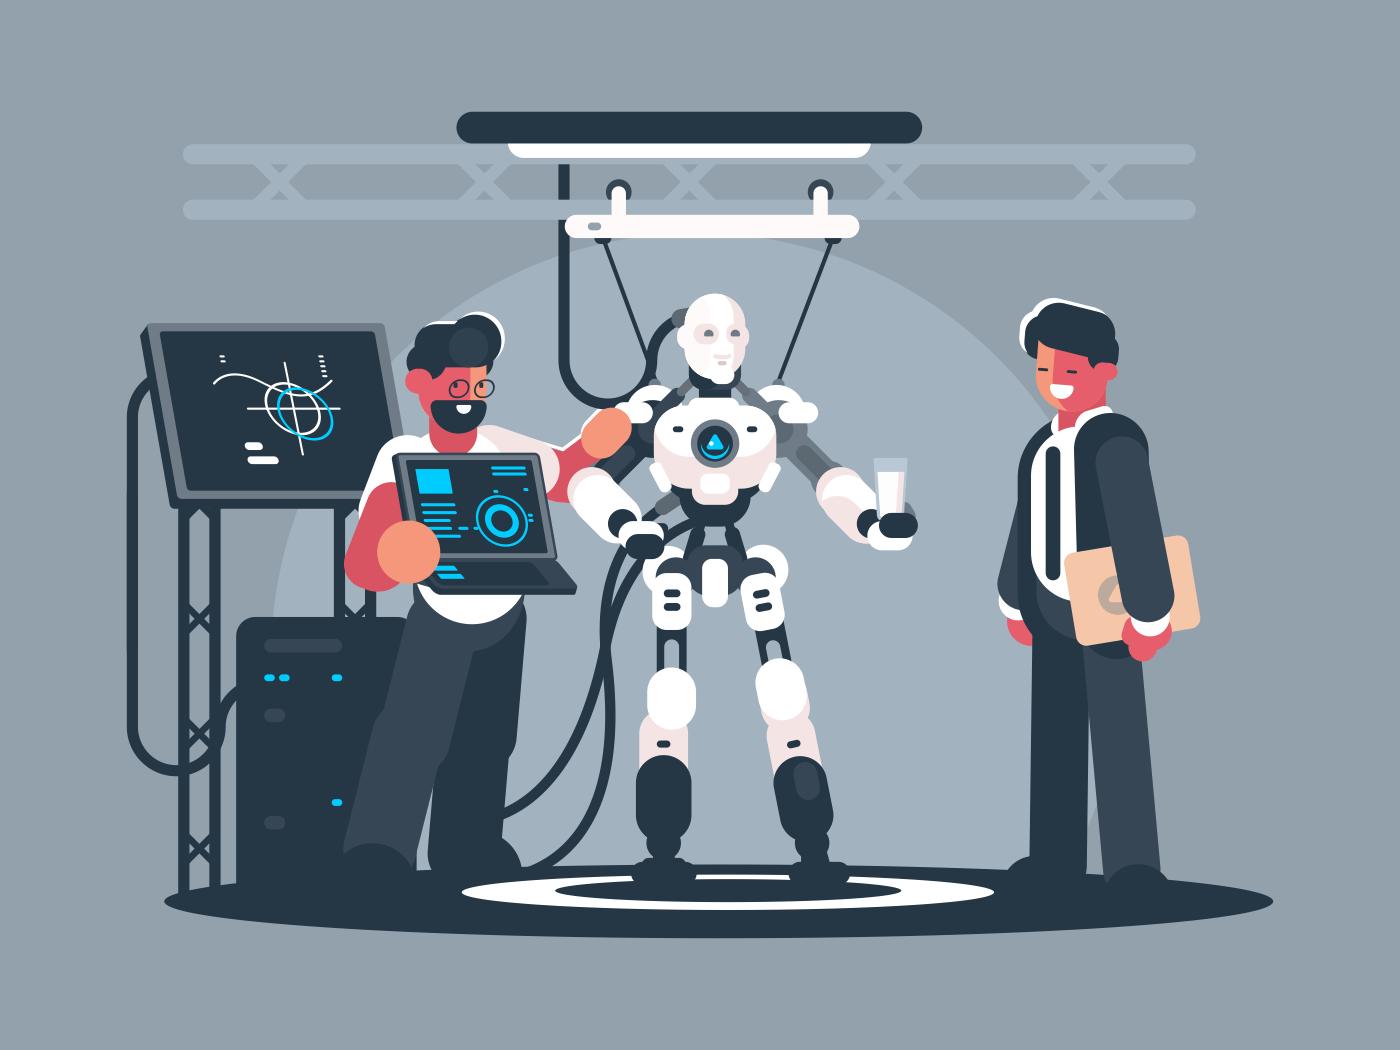 Presentation of modern robot. Robotics engineer shows new technologies. Vector illustration